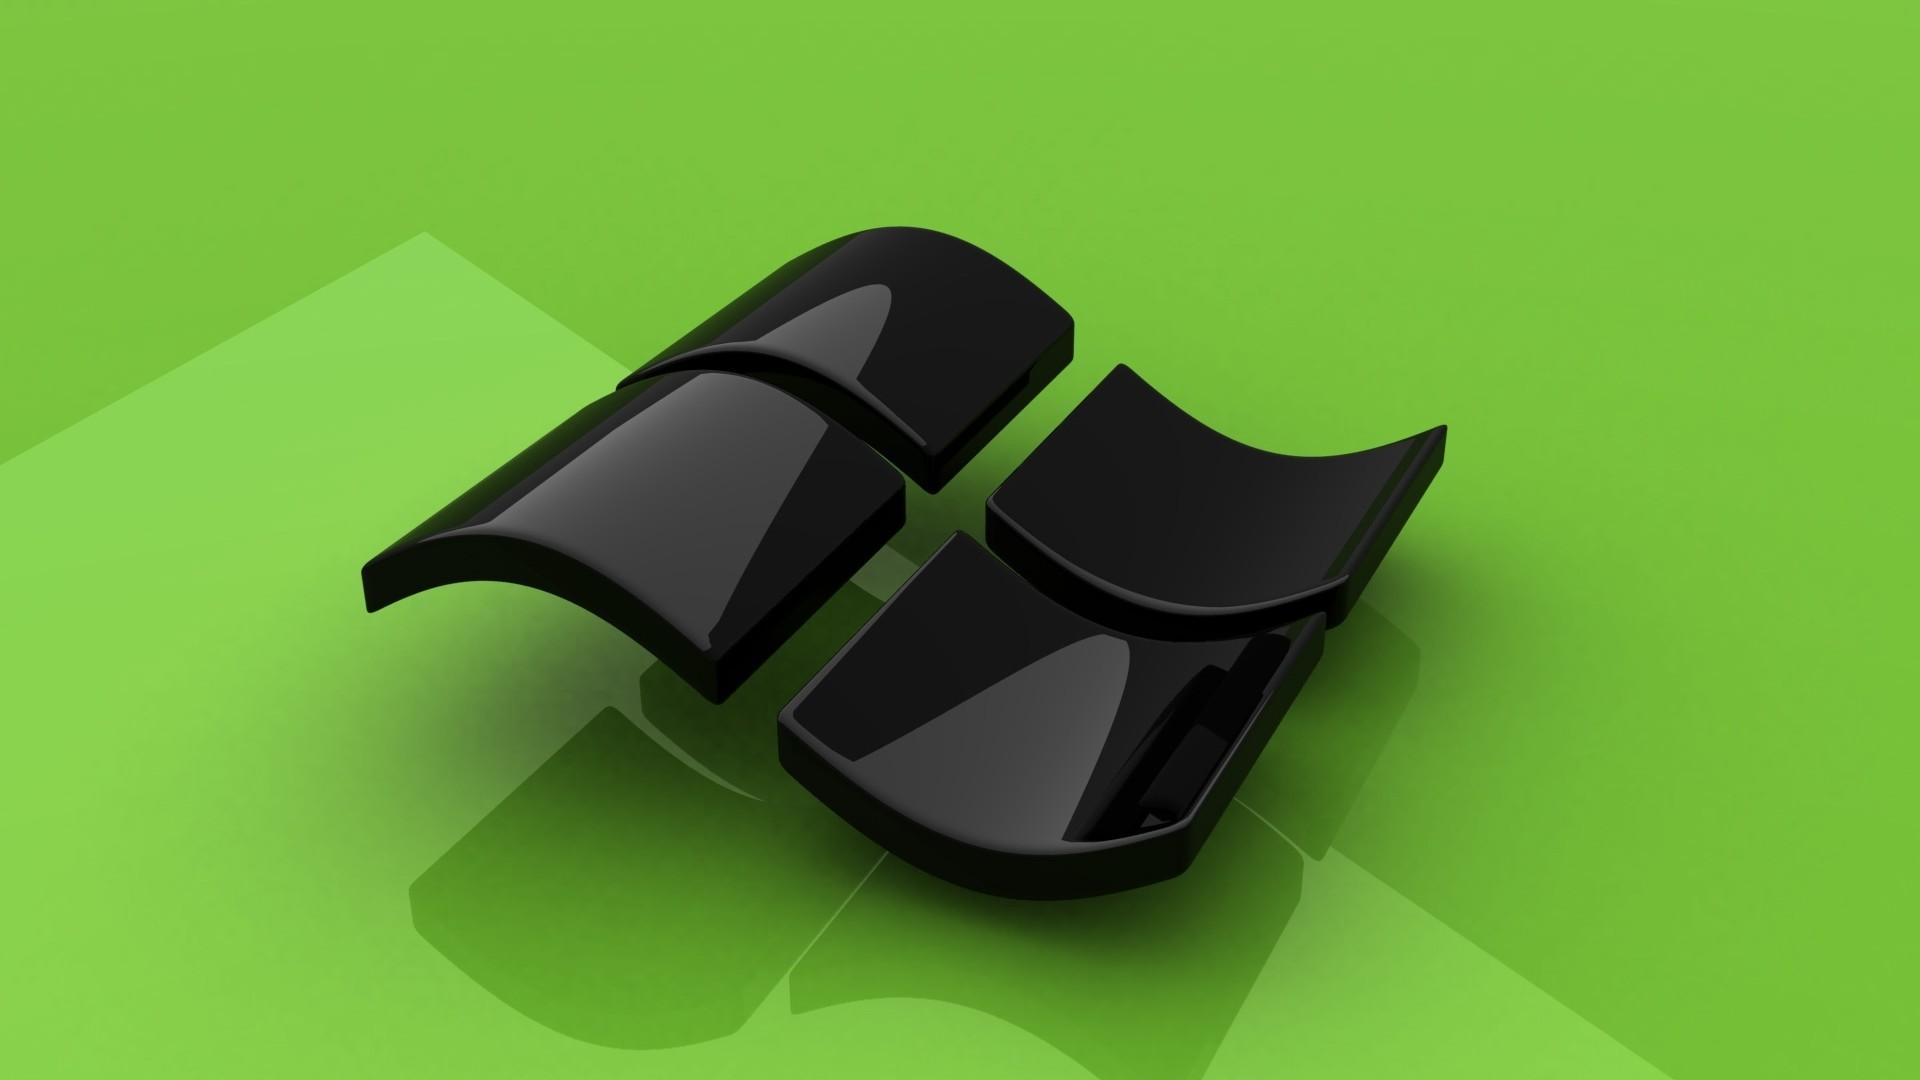 … 3d Wallpaper, Background Full HD 1080p. Wallpaper windows,  operating system, logo, background, …